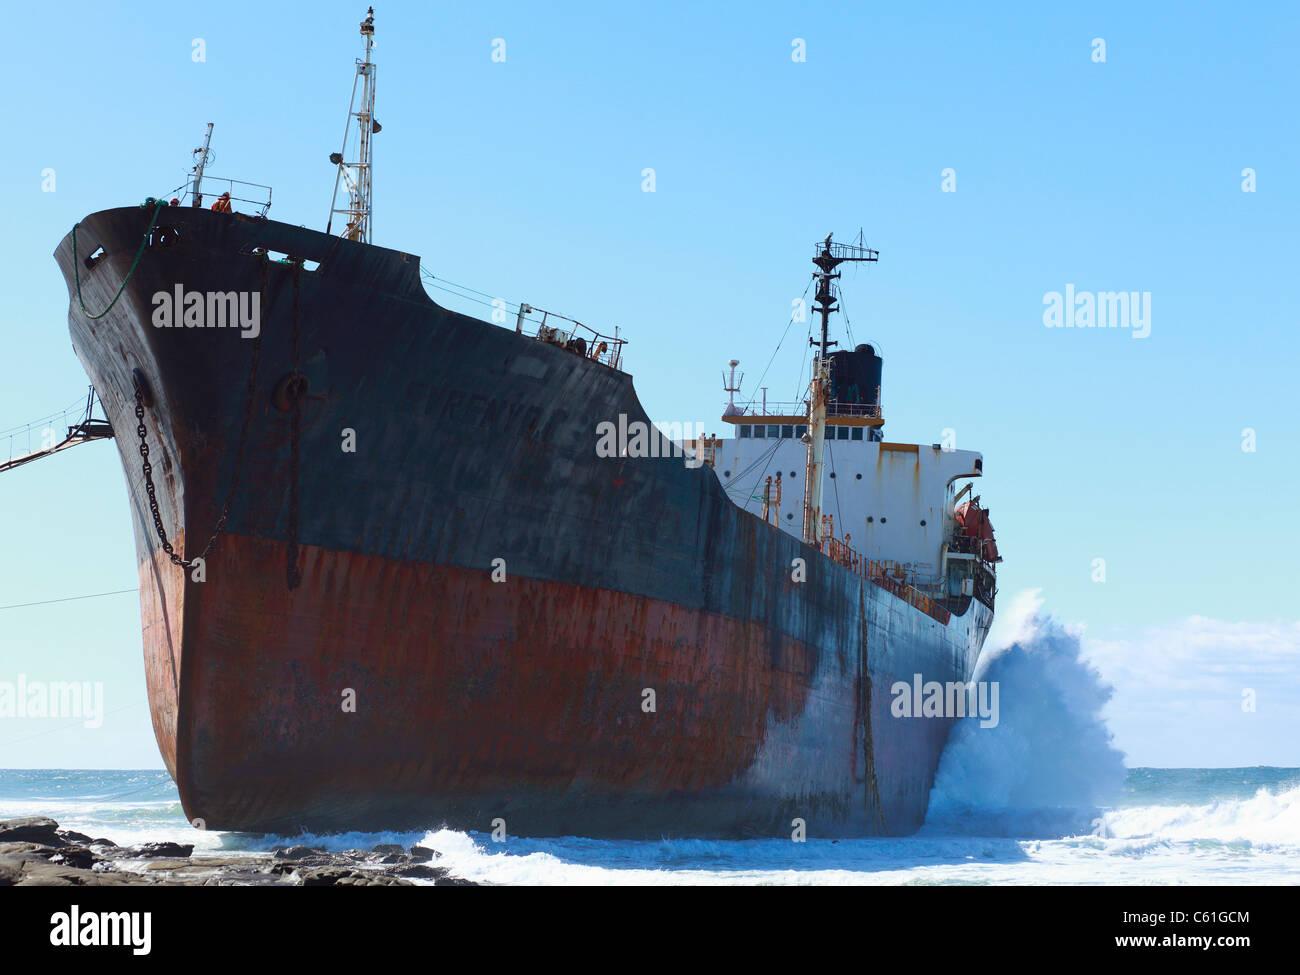 The 164 metre bulk tanker, Phoenix, aground on a rocky shelf at Christmas Bay, Sheffield Beach, KwaZulu Natal, South - Stock Image